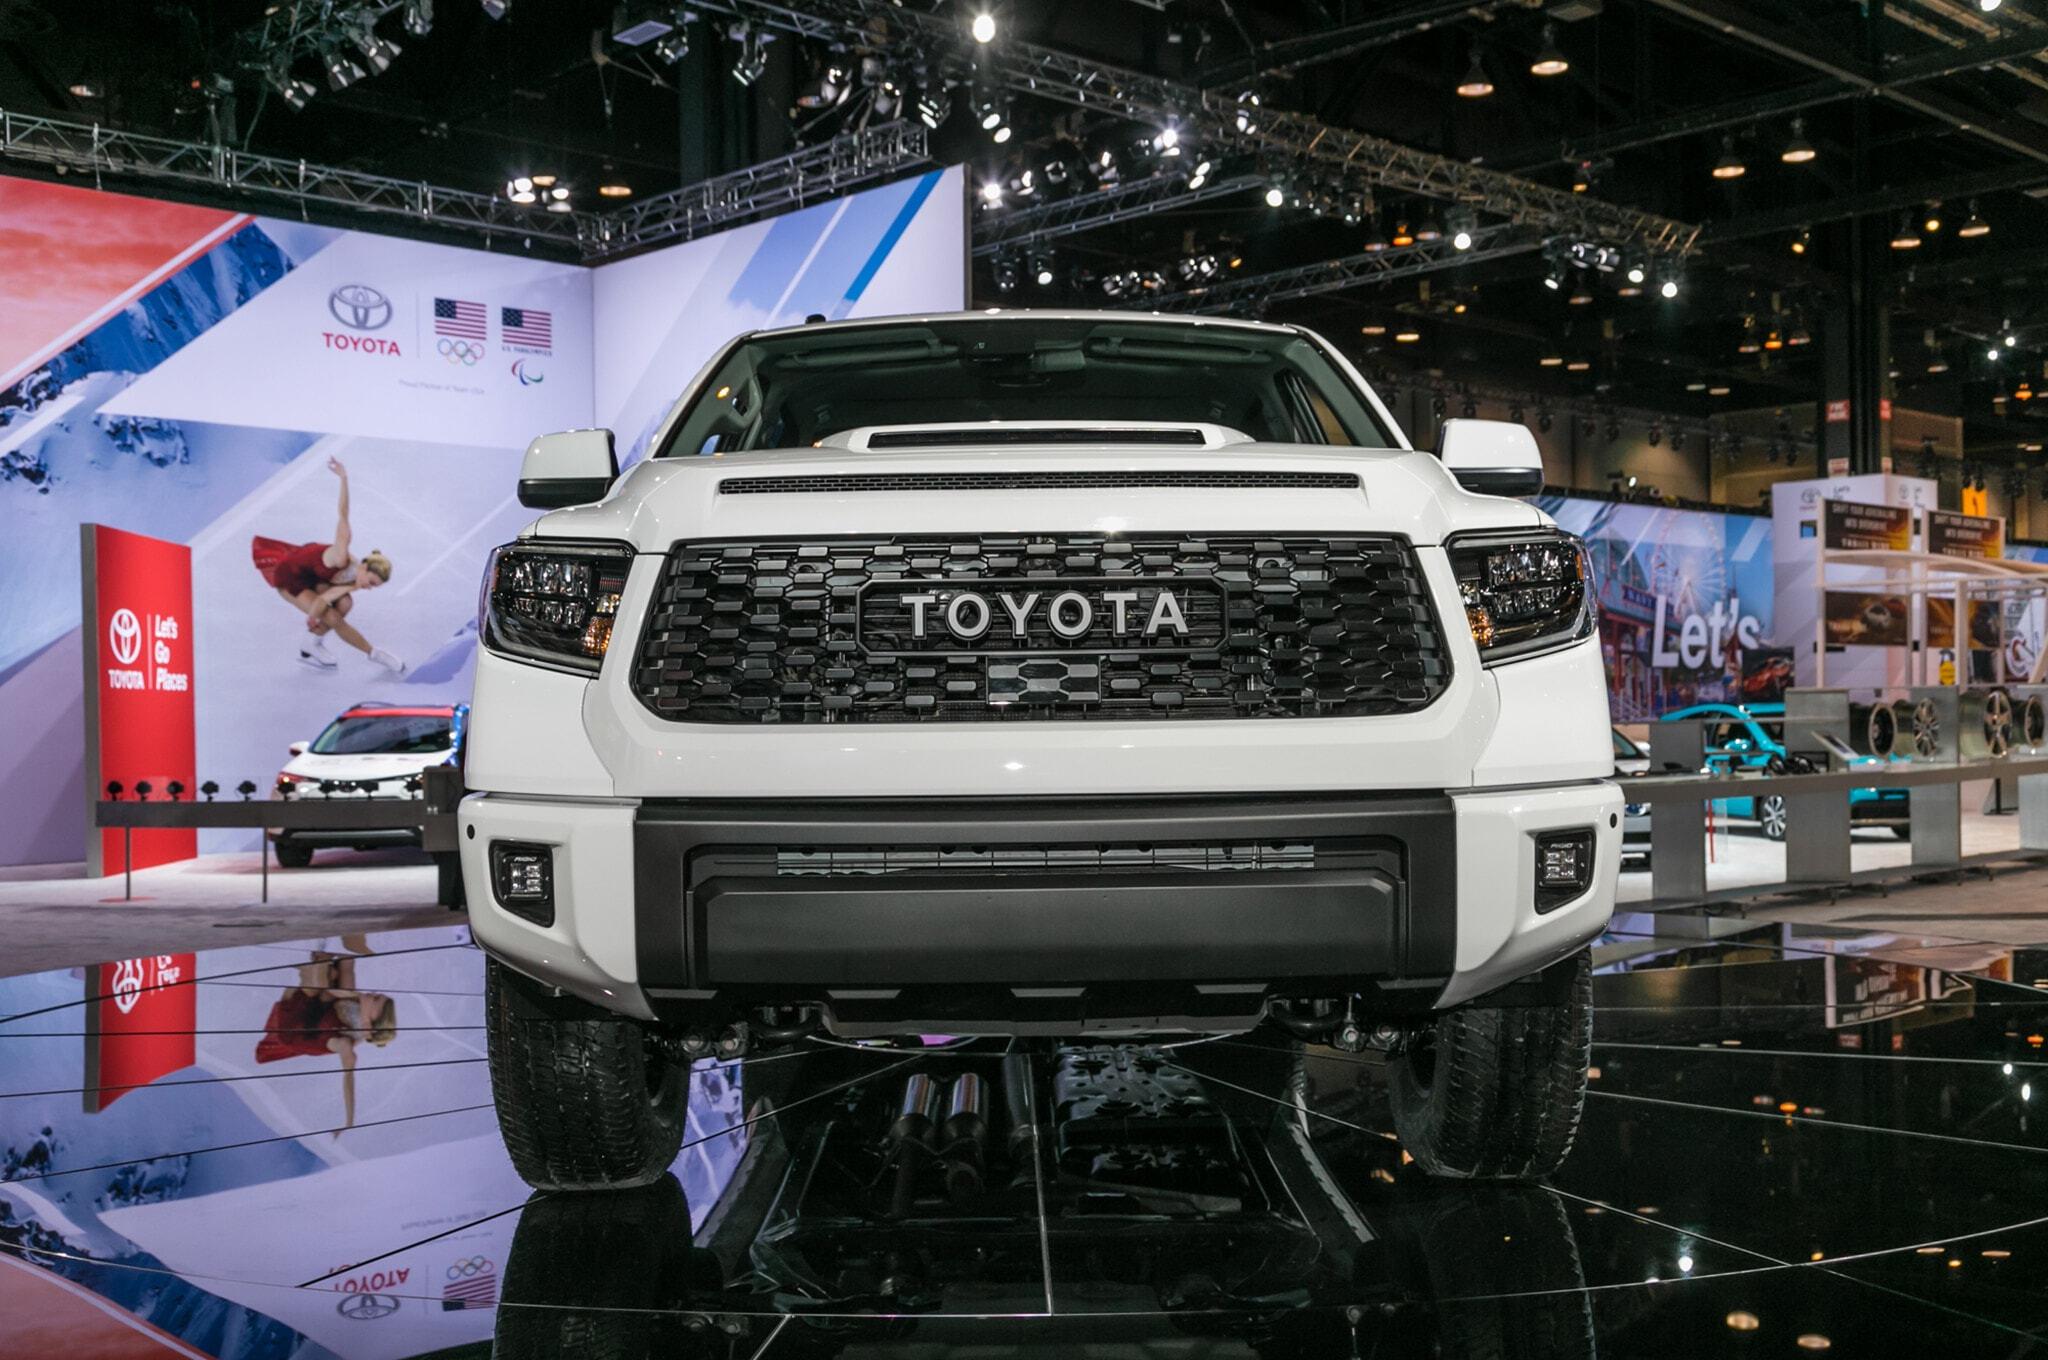 2019-Toyota-Tundra-TRD-Pro-front